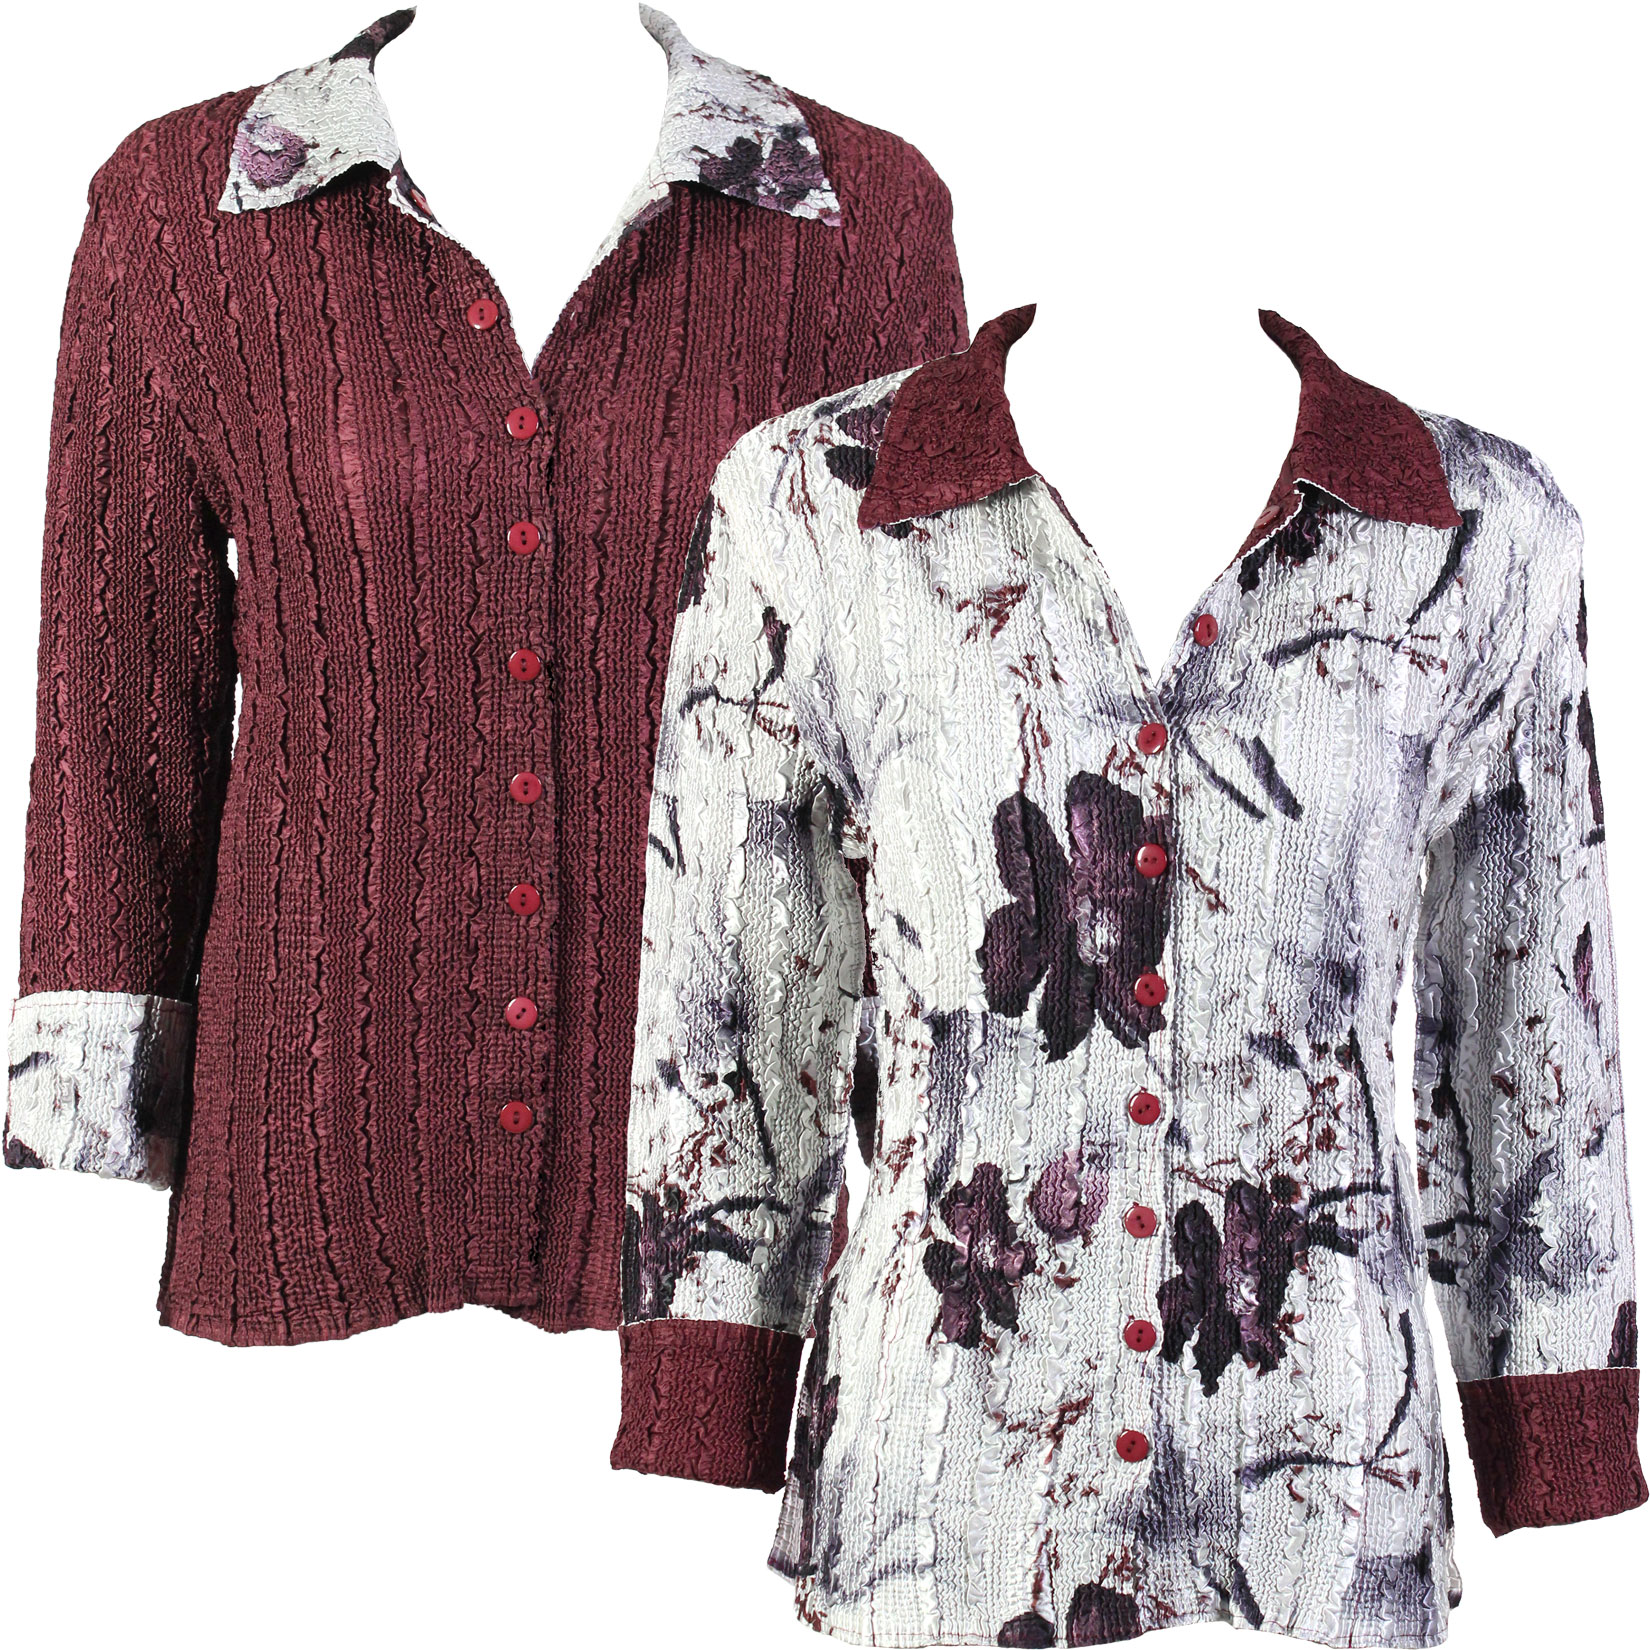 Wholesale Magic Crush - Reversible Jackets #5759 - L-XL